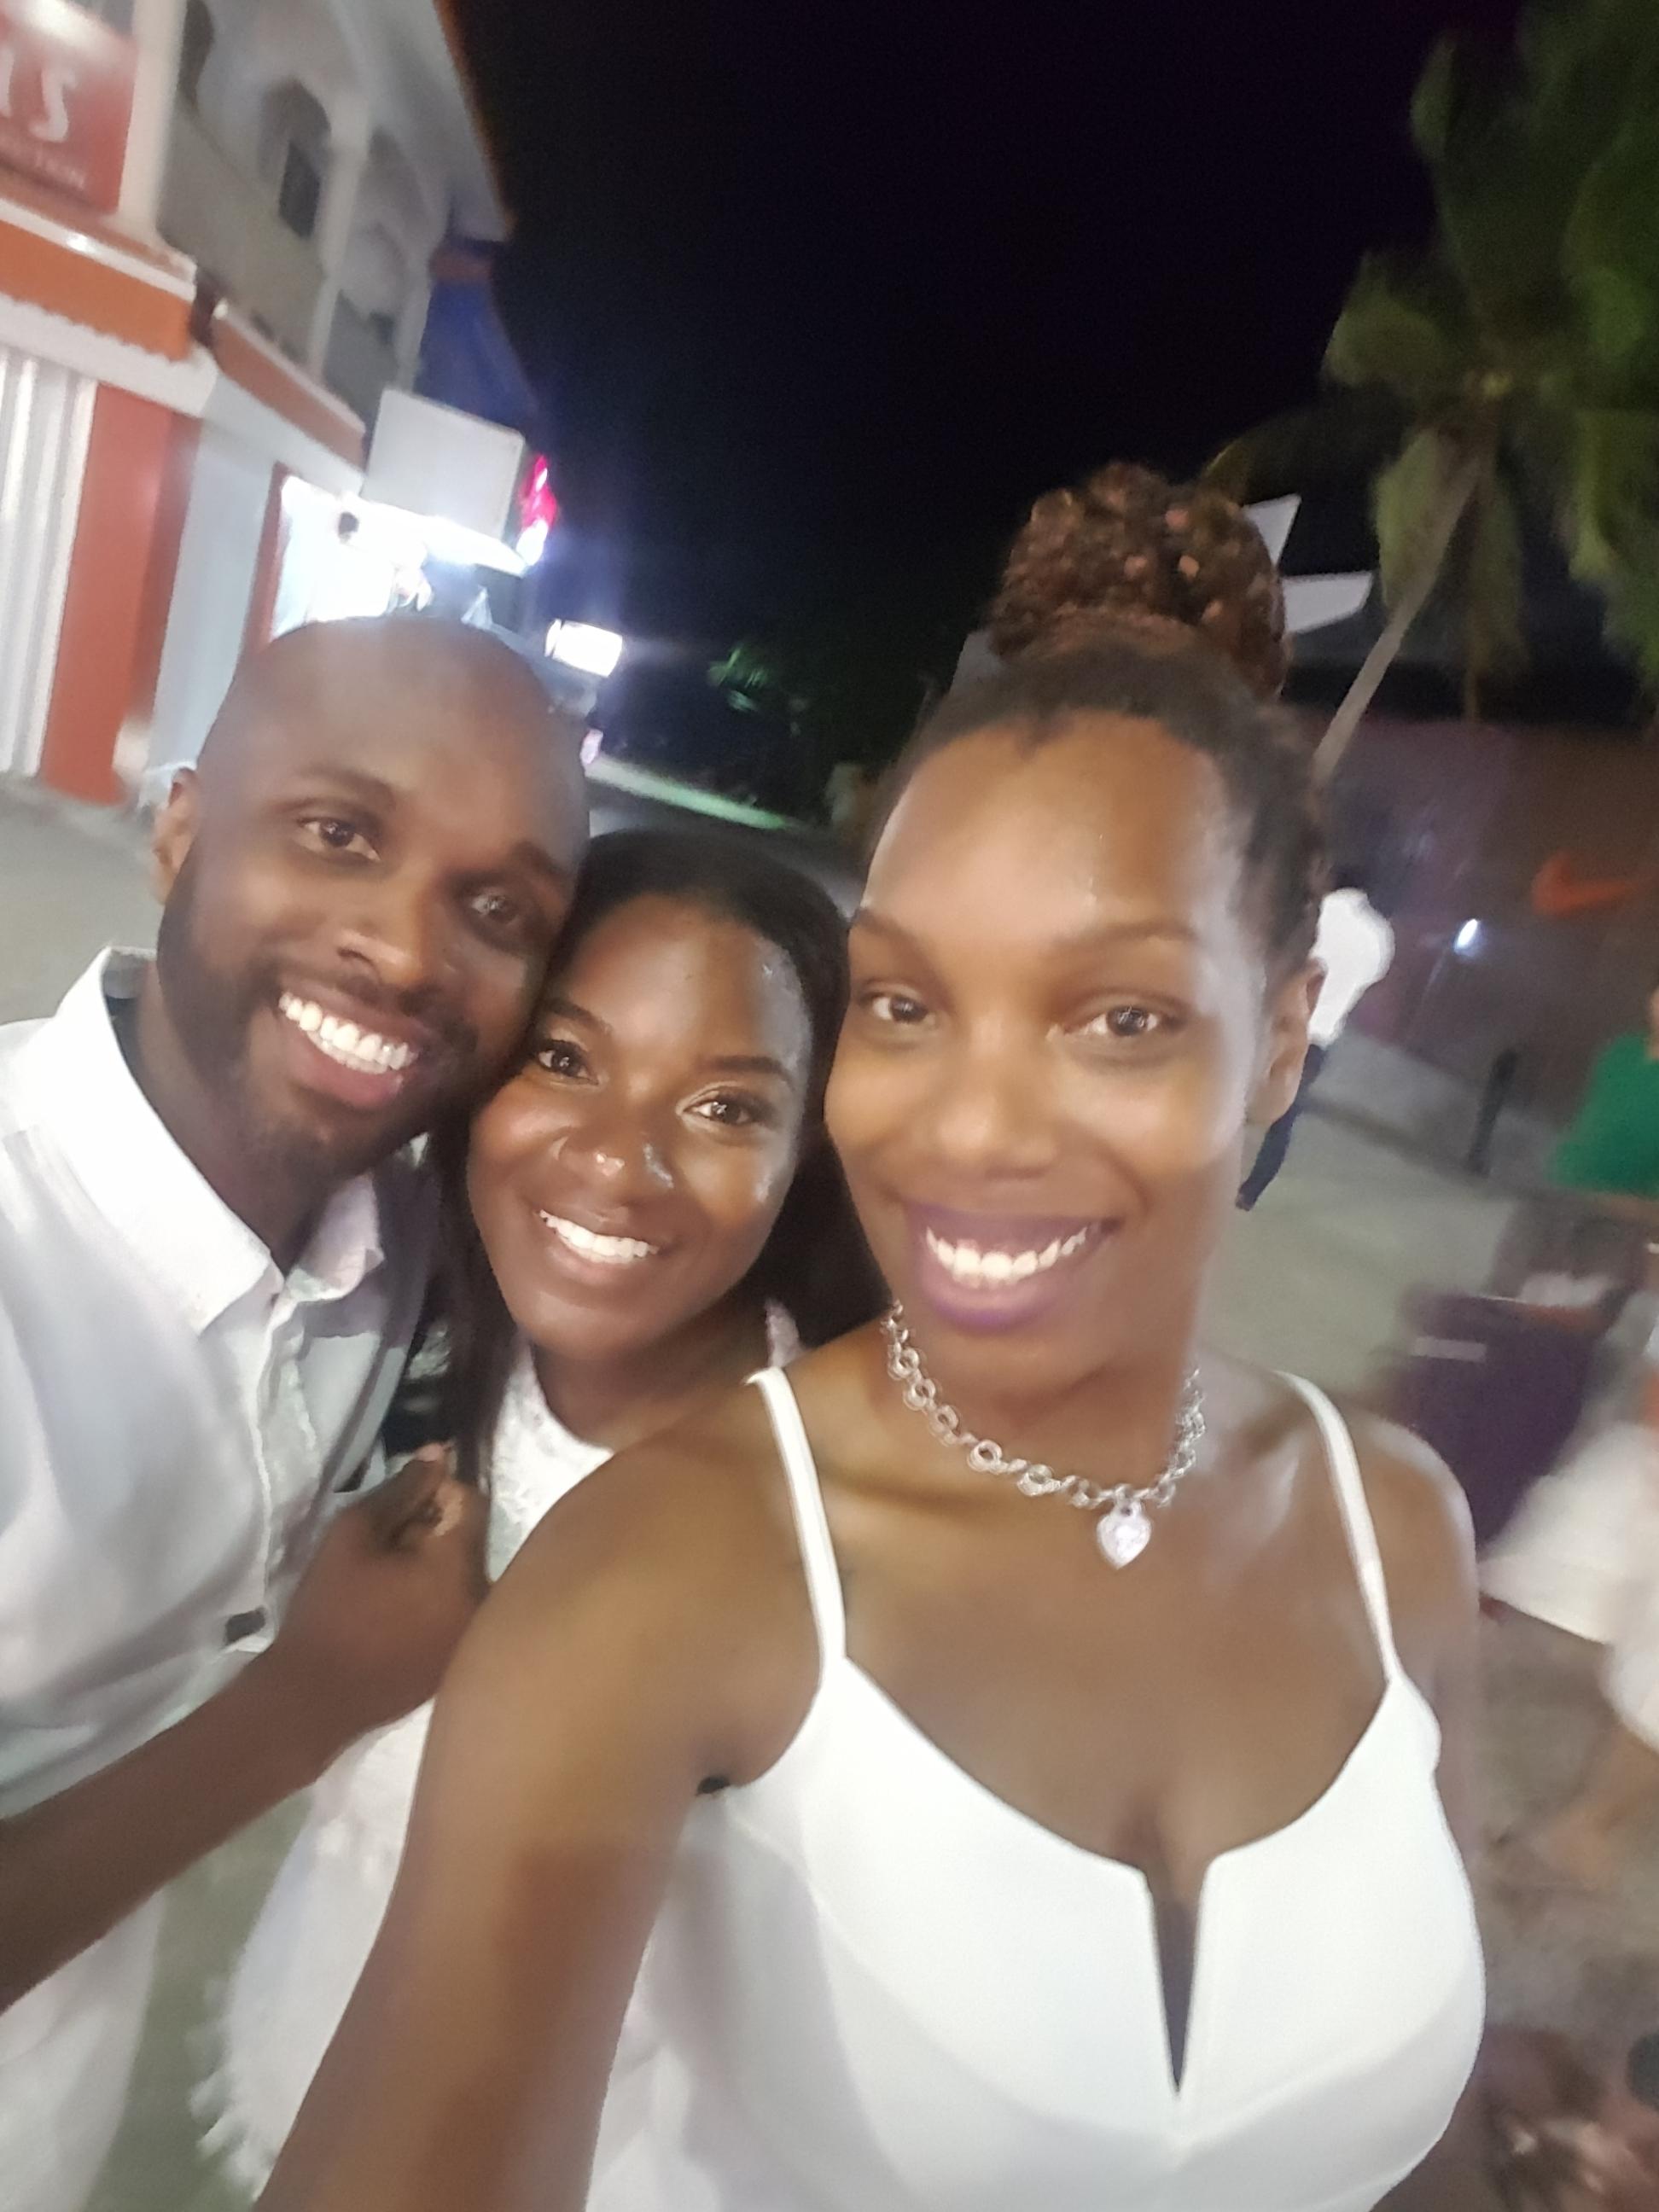 Black Destination Bride - BlackDesti Wedding Countdown Journal - Bridefriends Podcast - 1 Playa del Carmen Mexico - Carboncitos Rooftop Downtown Party2.jpg